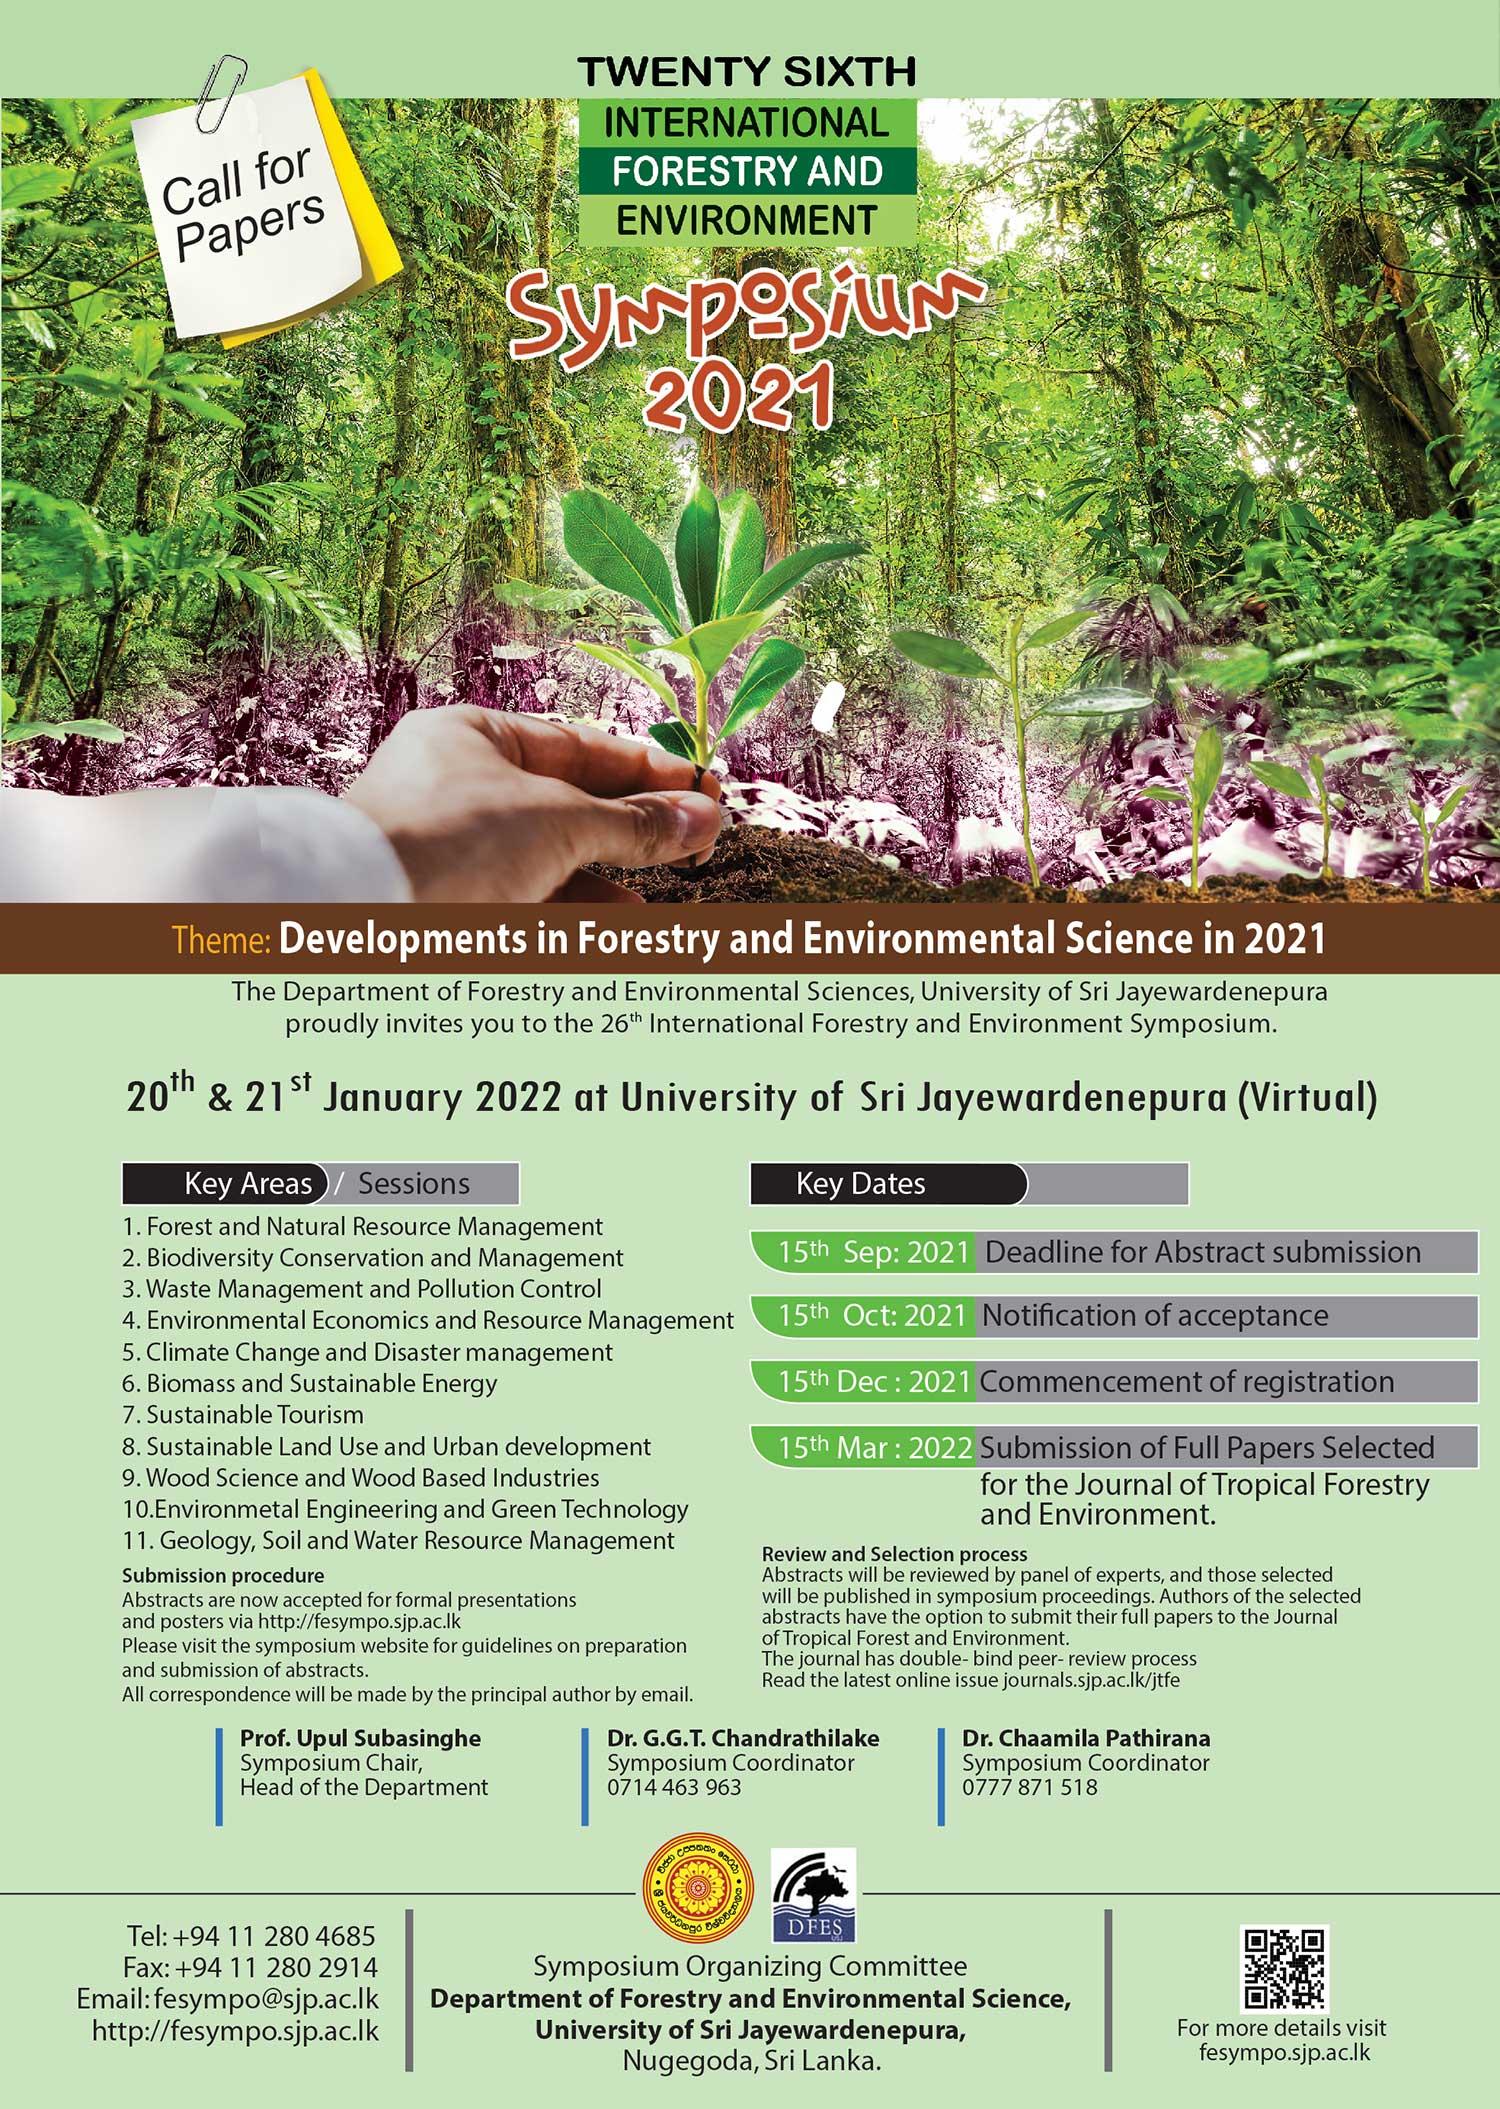 26th International Forestry Symposium 2021